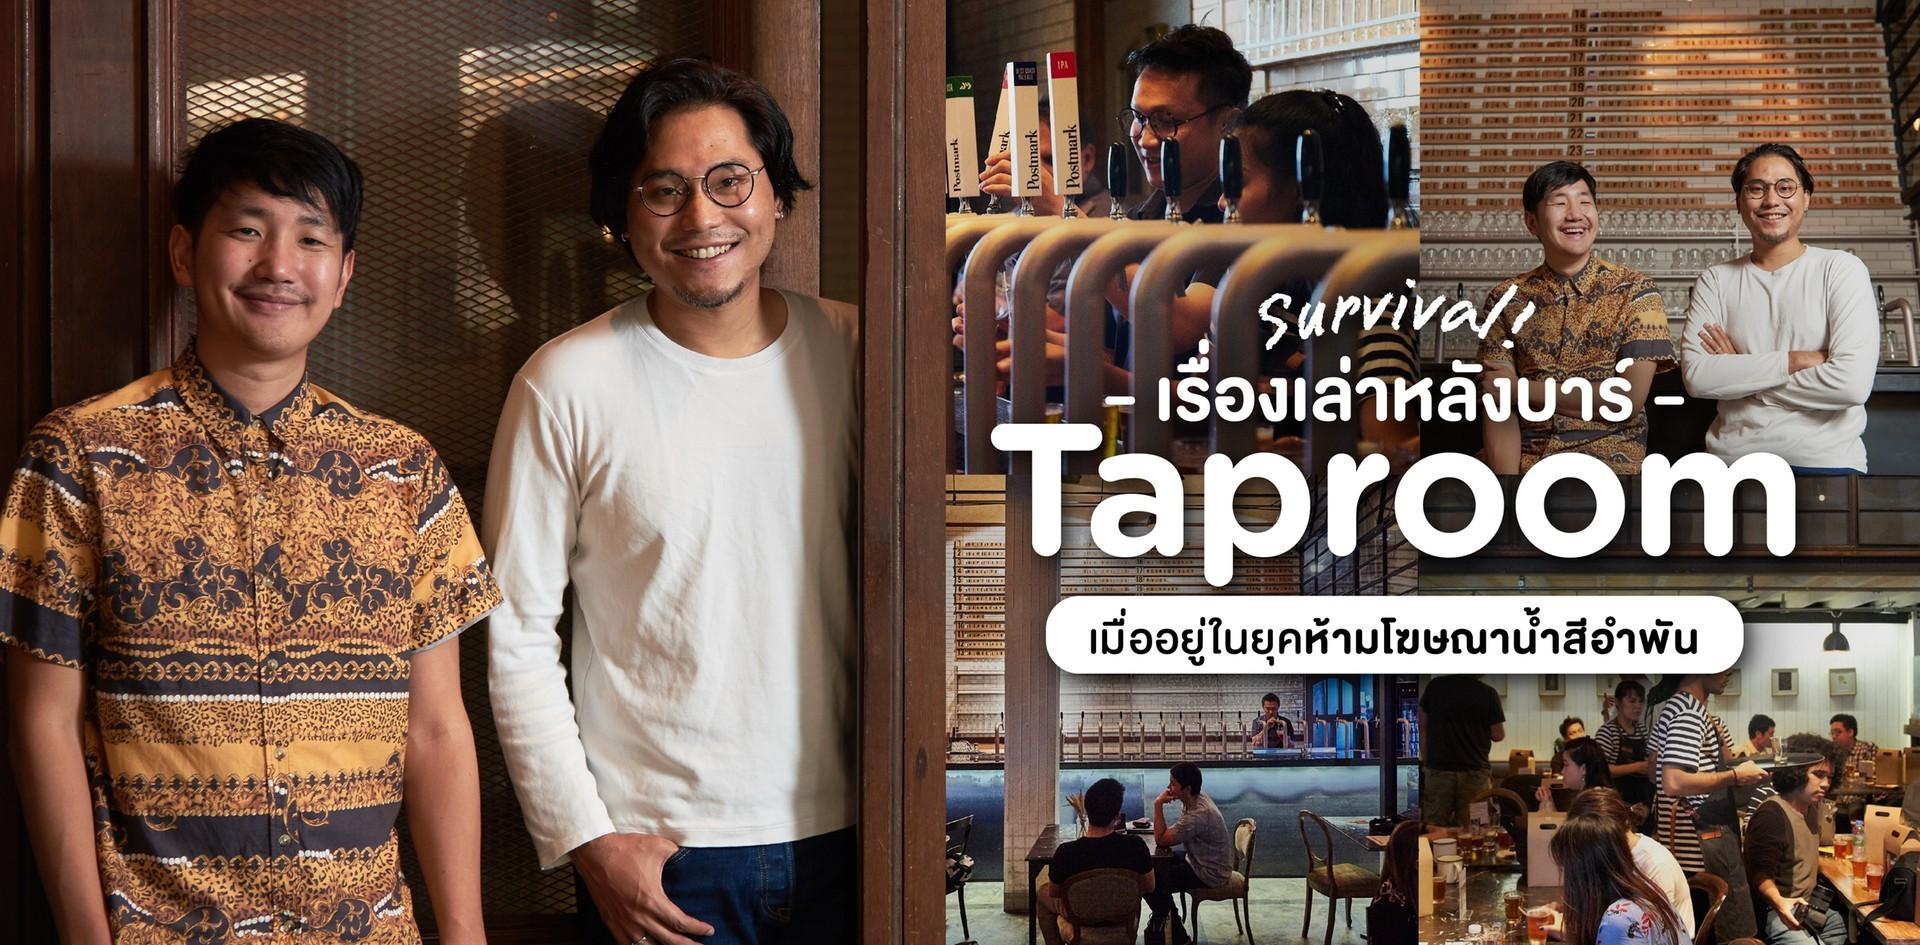 Survival! เรื่องเล่าหลังบาร์ Taproom เมื่ออยู่ในยุคห้ามโฆษณาน้ำสีอำพัน